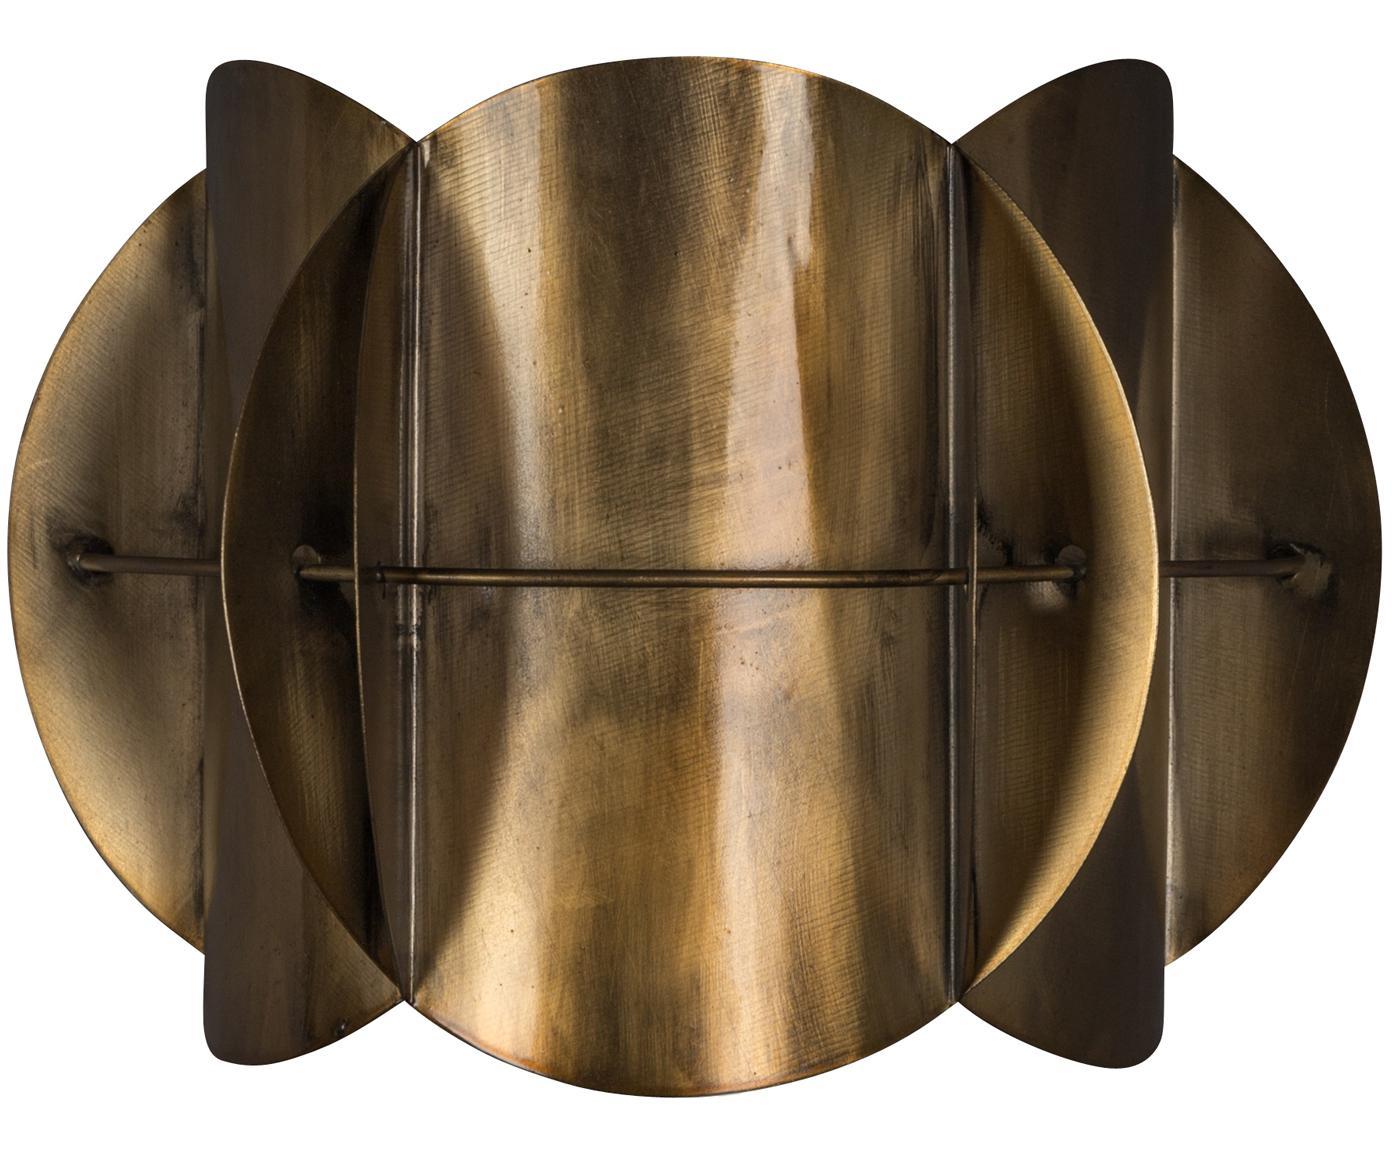 Aplique Corridor, Pantalla: latón, Cable: cubierto en tela, Latón con efecto envejecido, An 27 x Al 19 cm